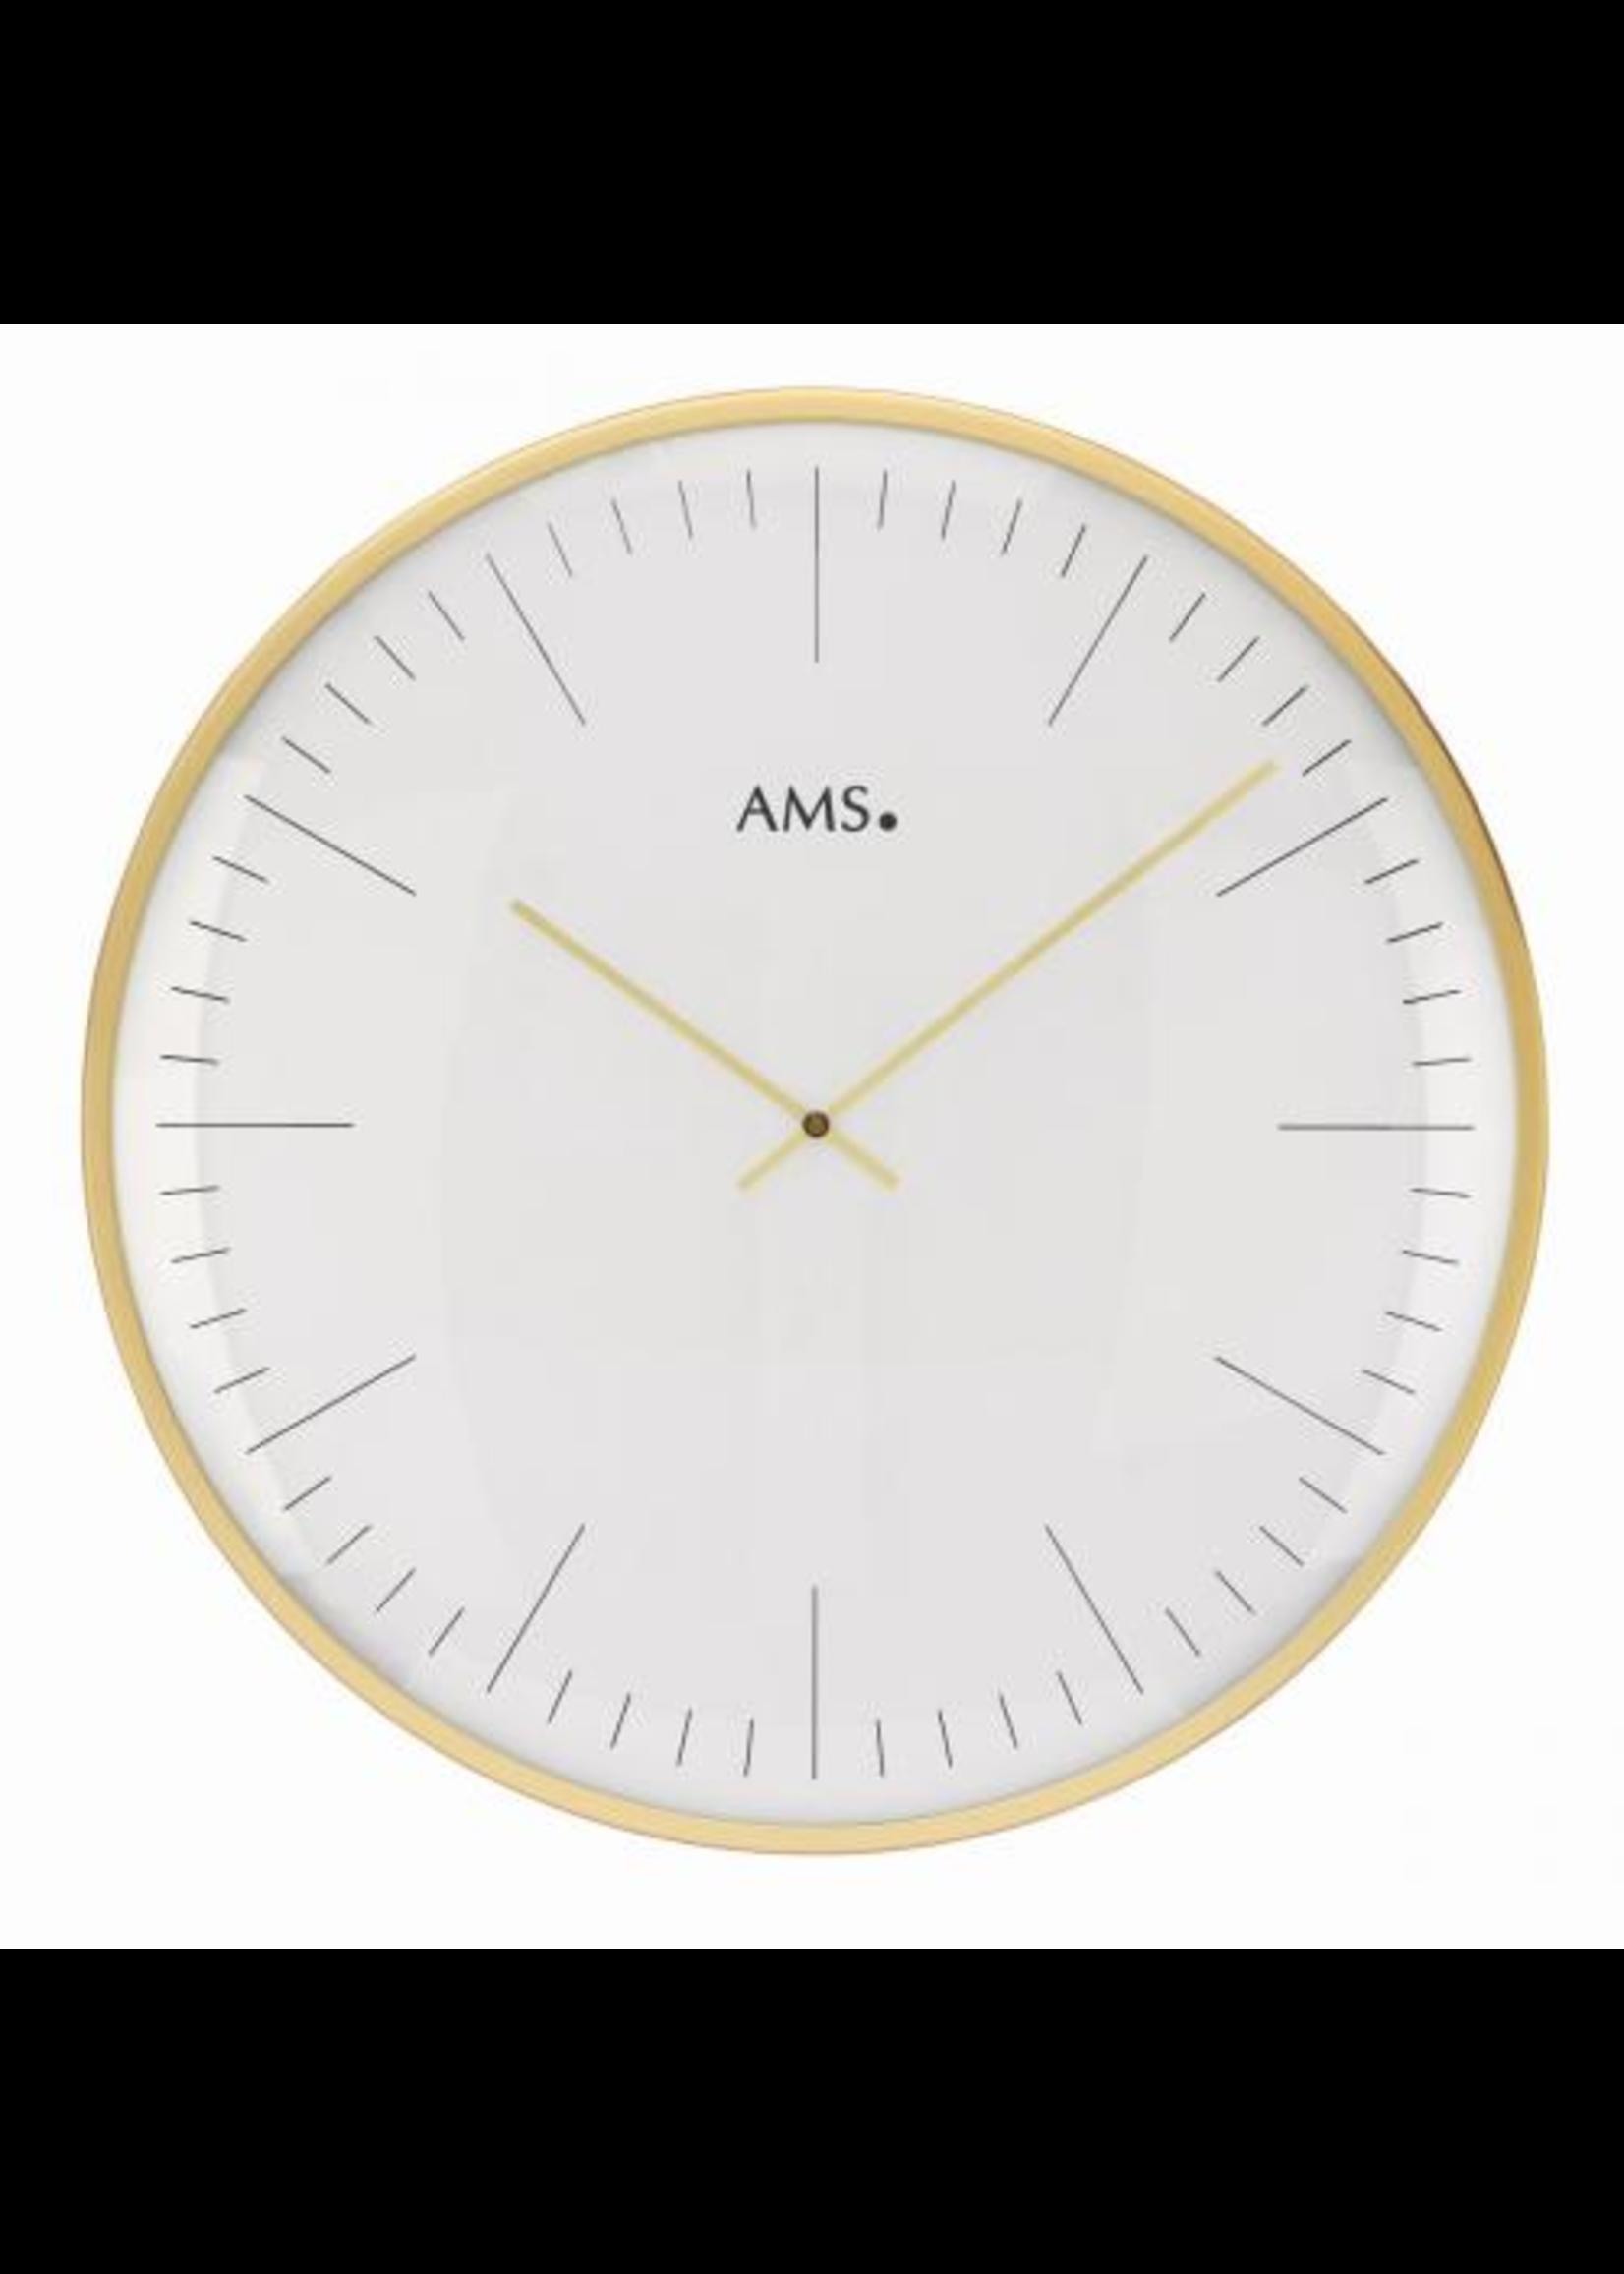 AMS Wandklok Goud en Wit Modern Design